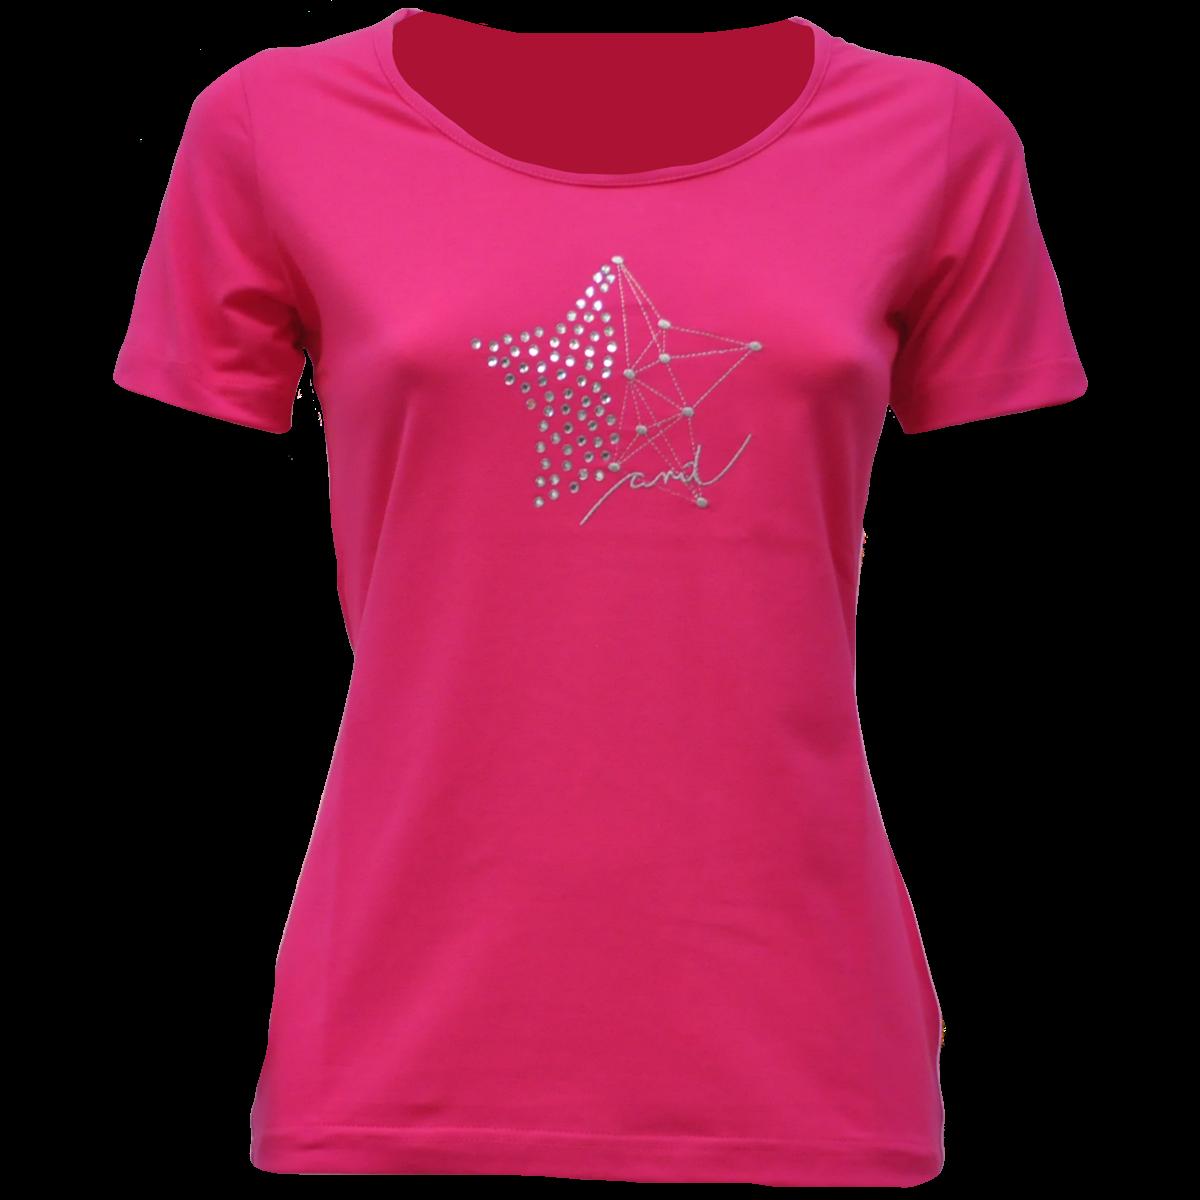 Alva_-_zenska_-_bombazna_-_majica_-_T_shirt_-_28.png